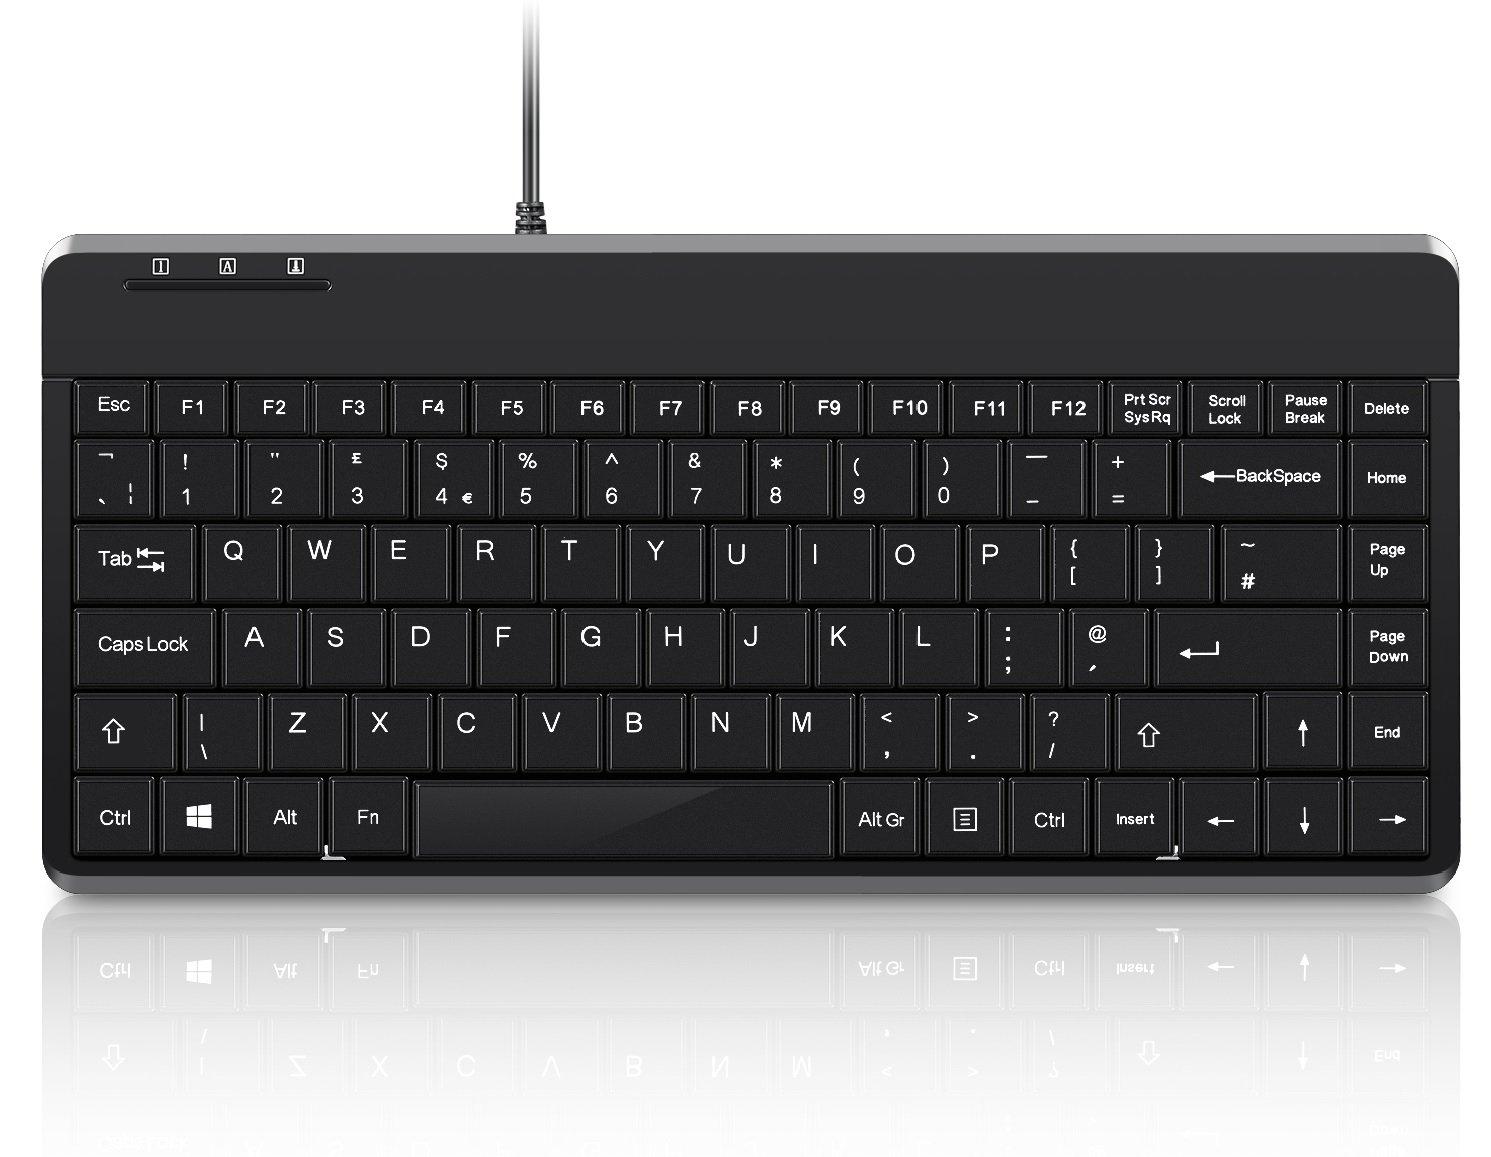 1ecfa617c1b Perixx PERIBOARD-409U Mini Wired Keyboard - USB - 315x147x21mm - UK Layout:  Amazon.co.uk: Computers & Accessories